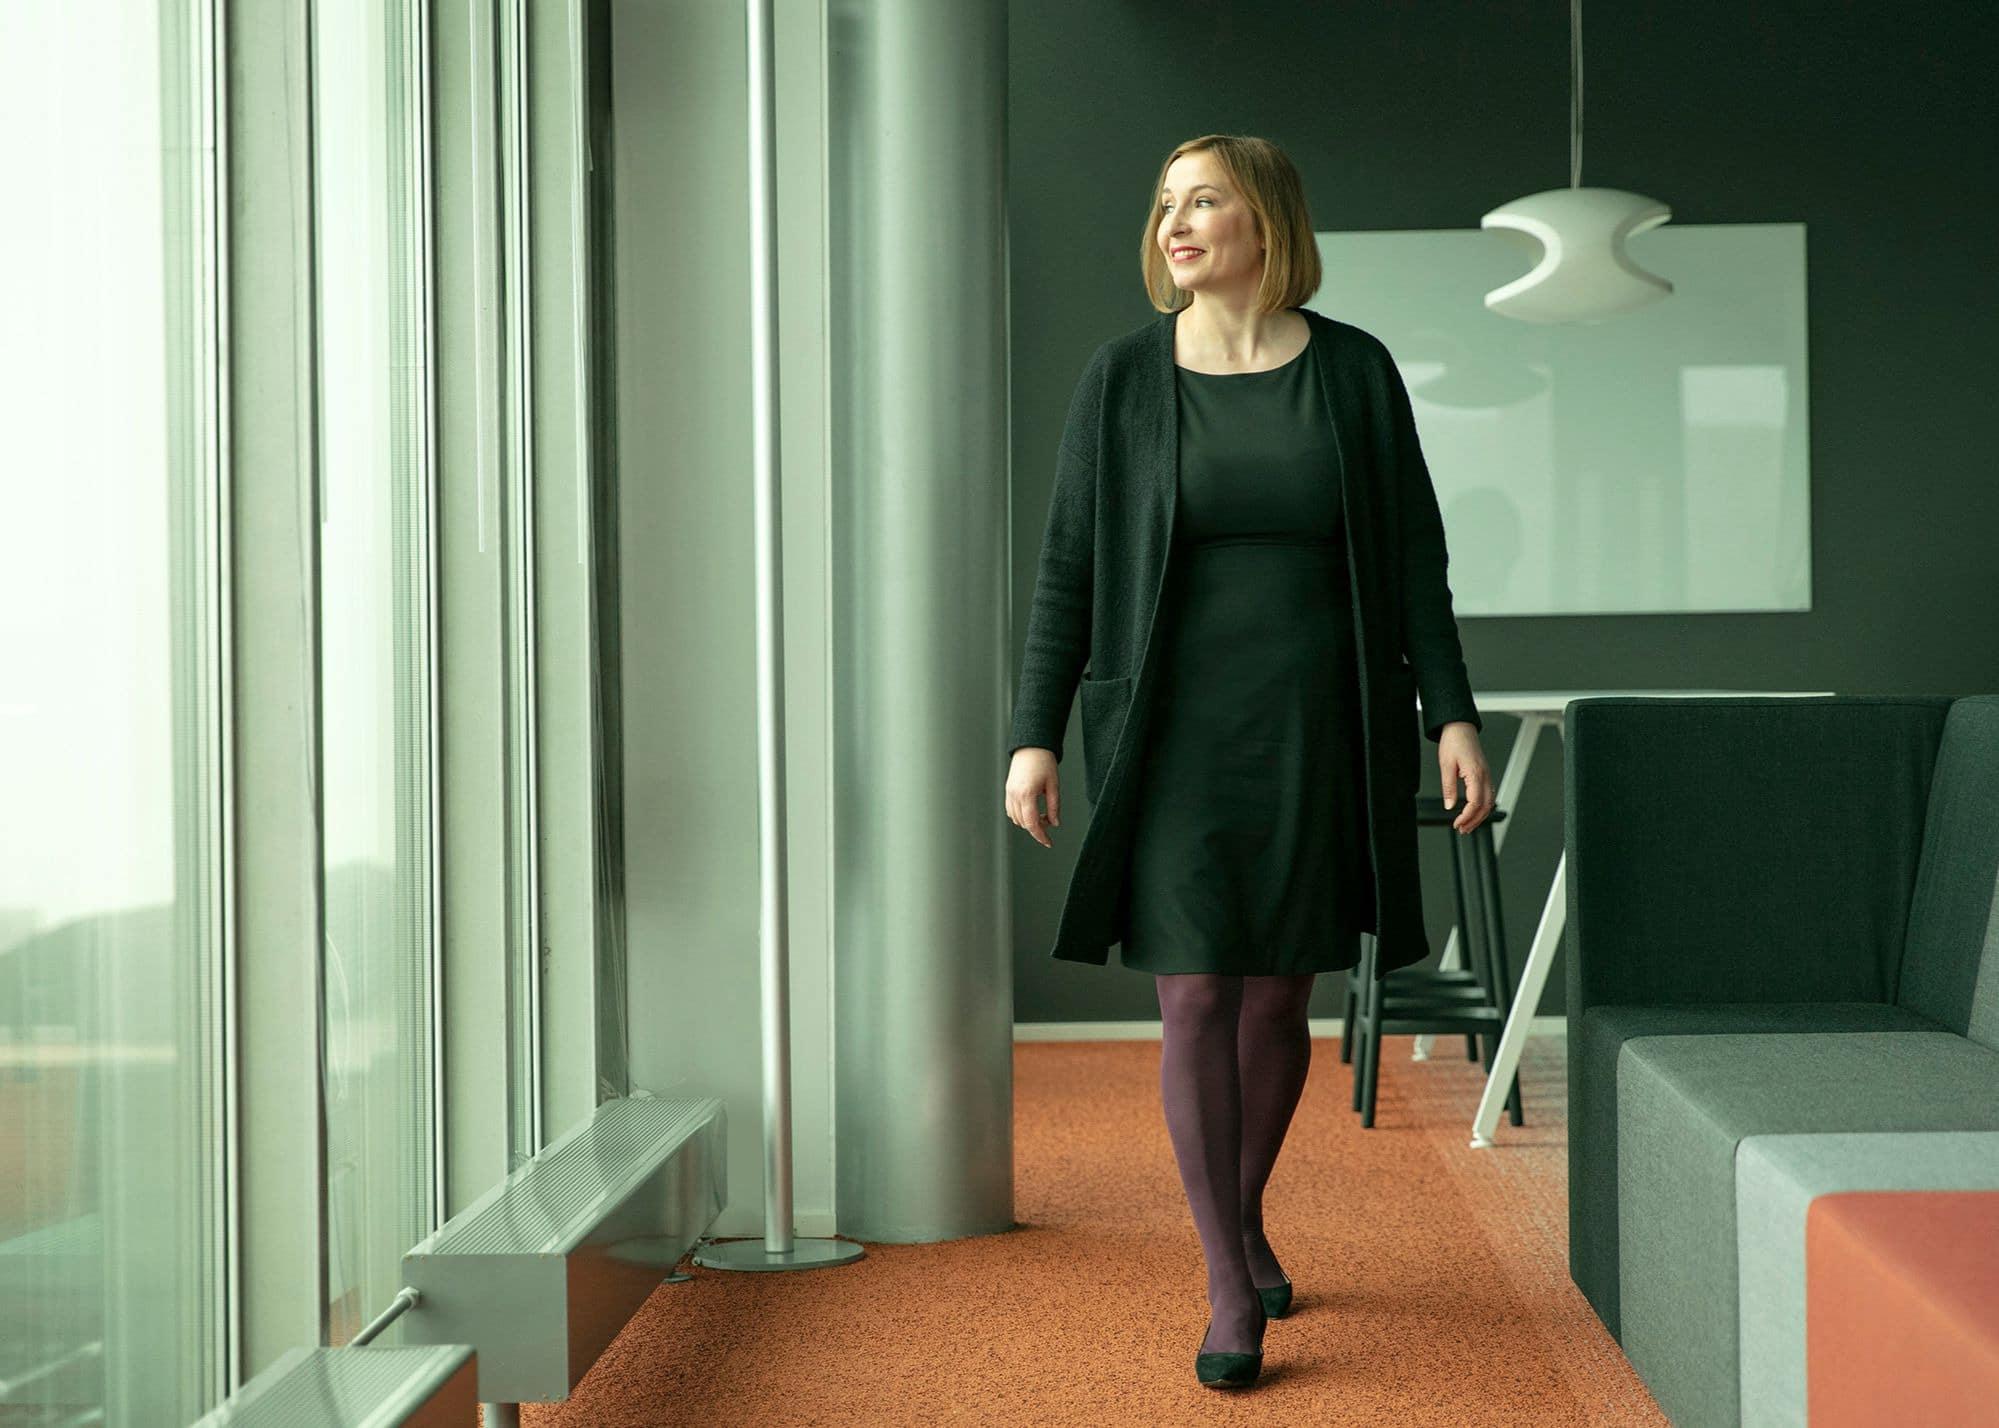 Sanna Häikiö_Counsel_IP and Technology Law_Kolster